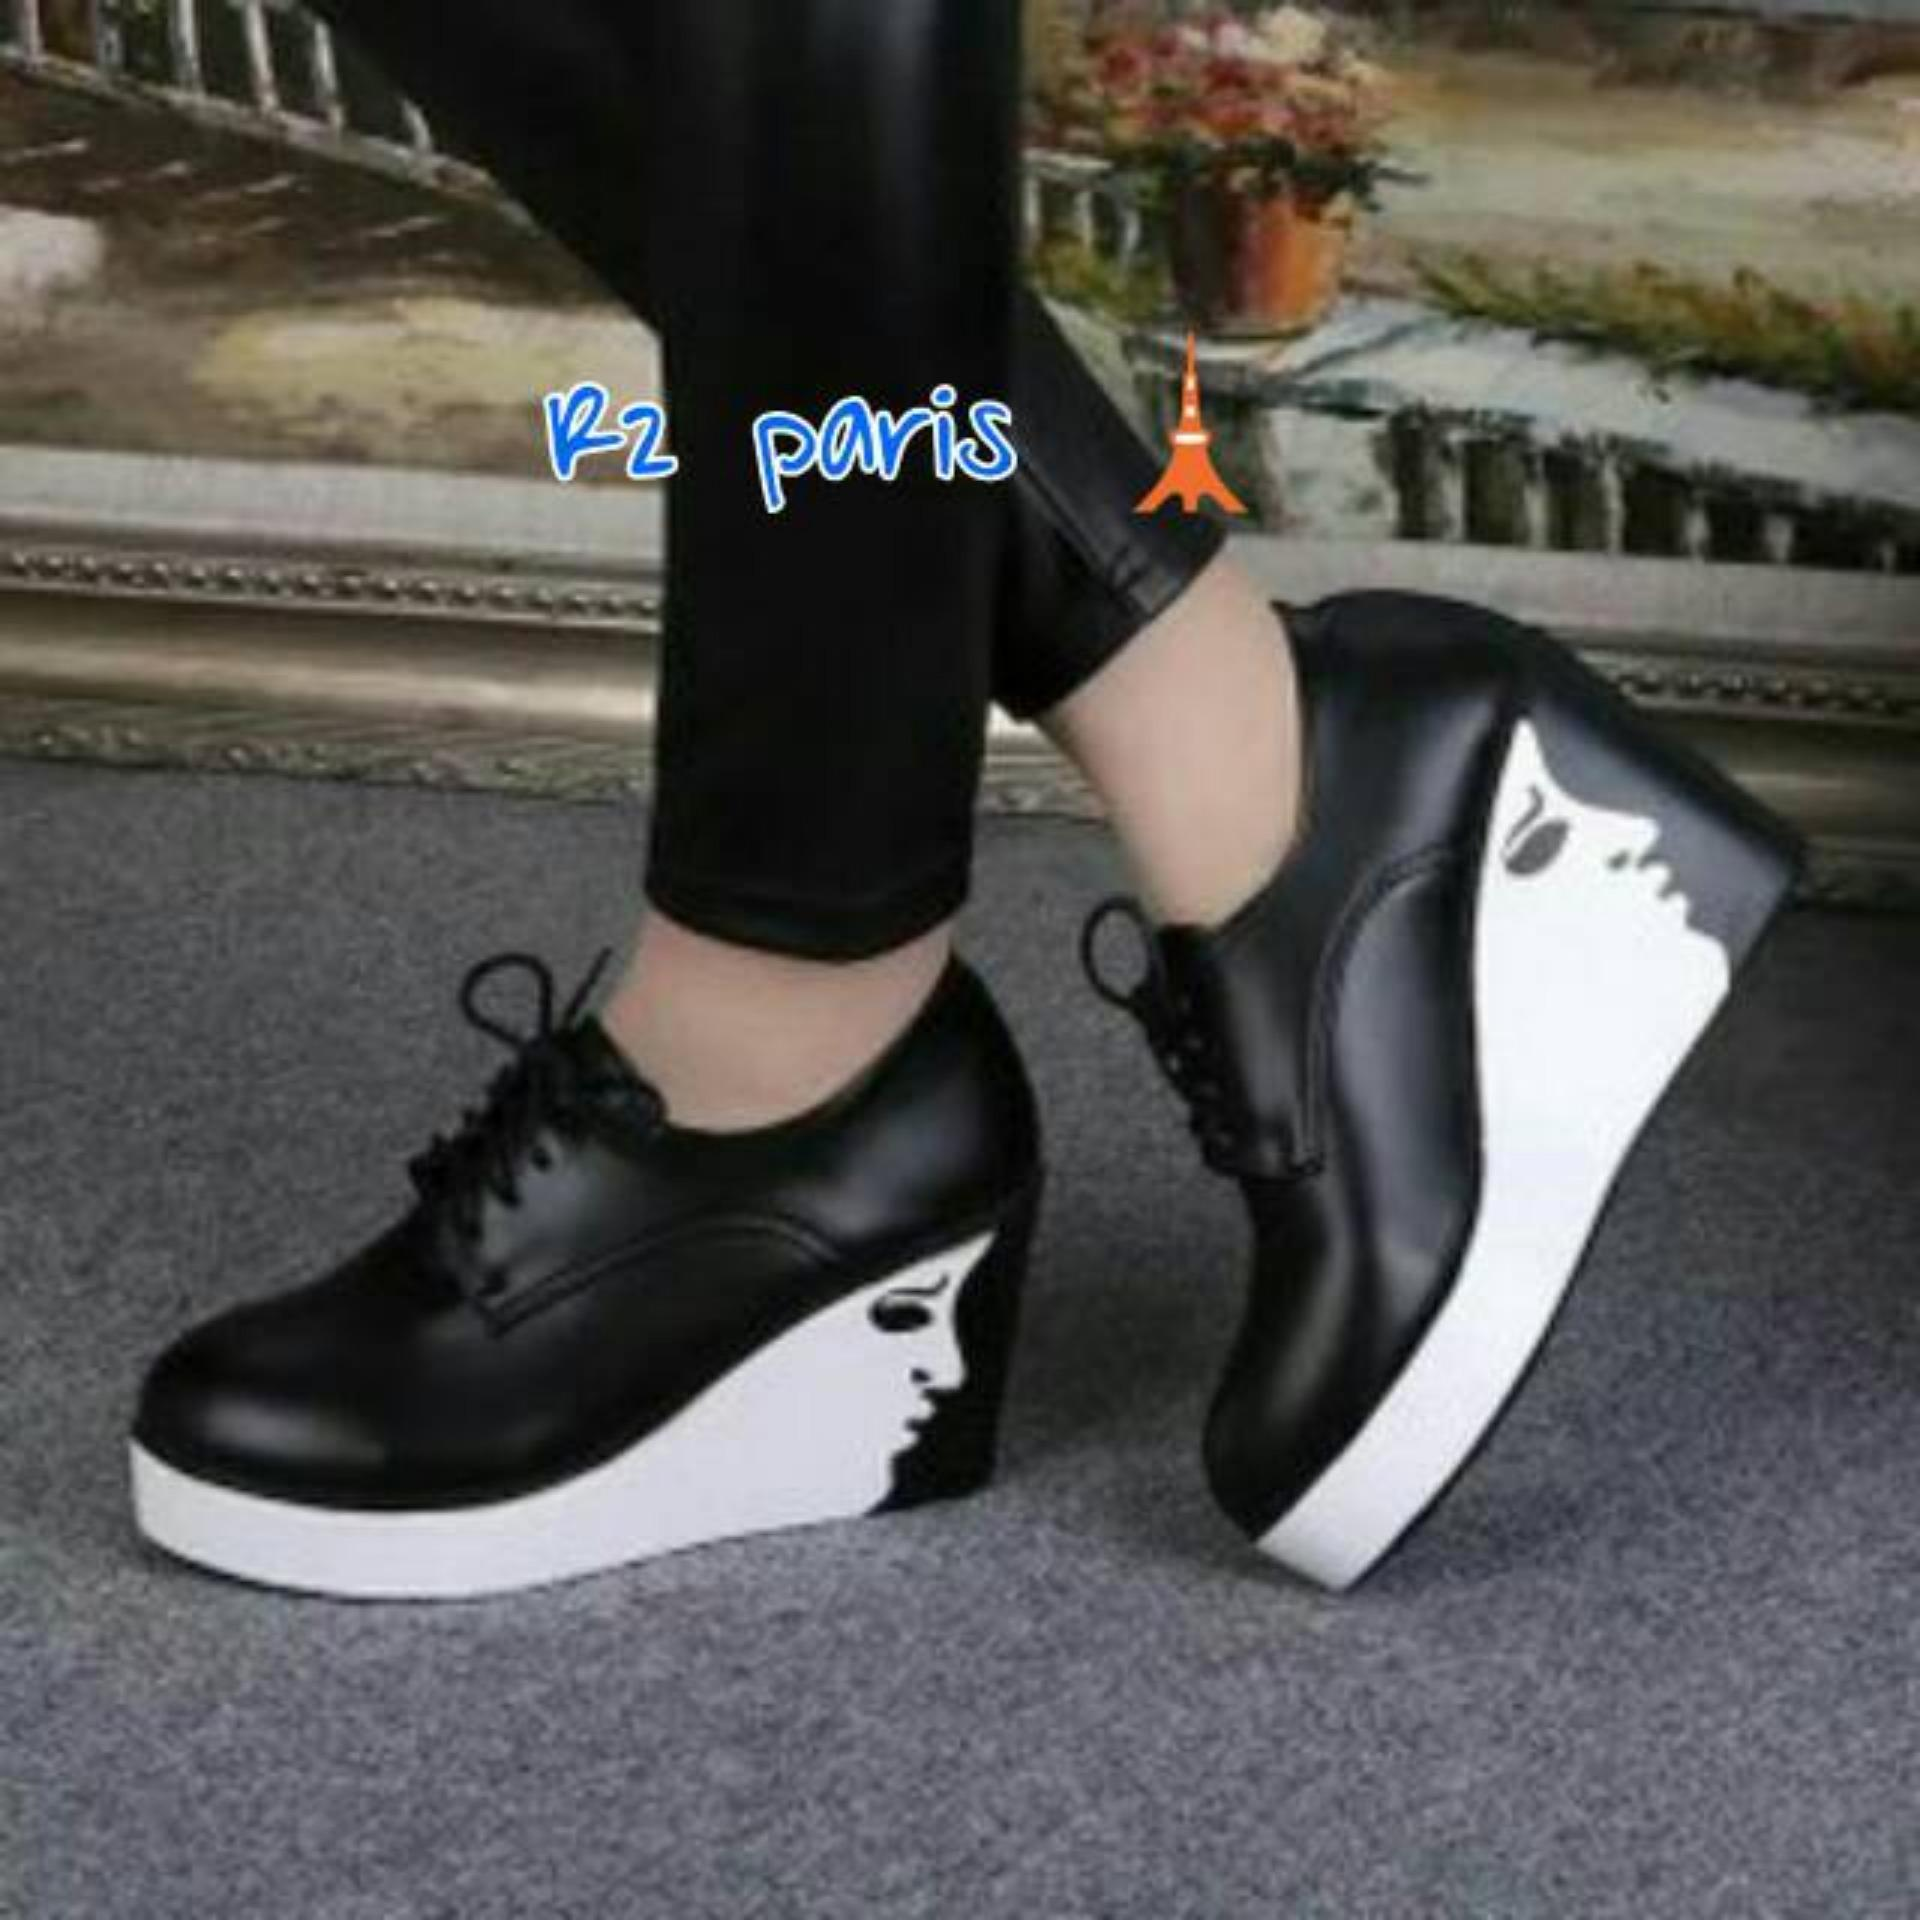 Beli sekarang R2Paris Wedges Boots Face Tali Hitam terbaik murah - Hanya Rp109.320